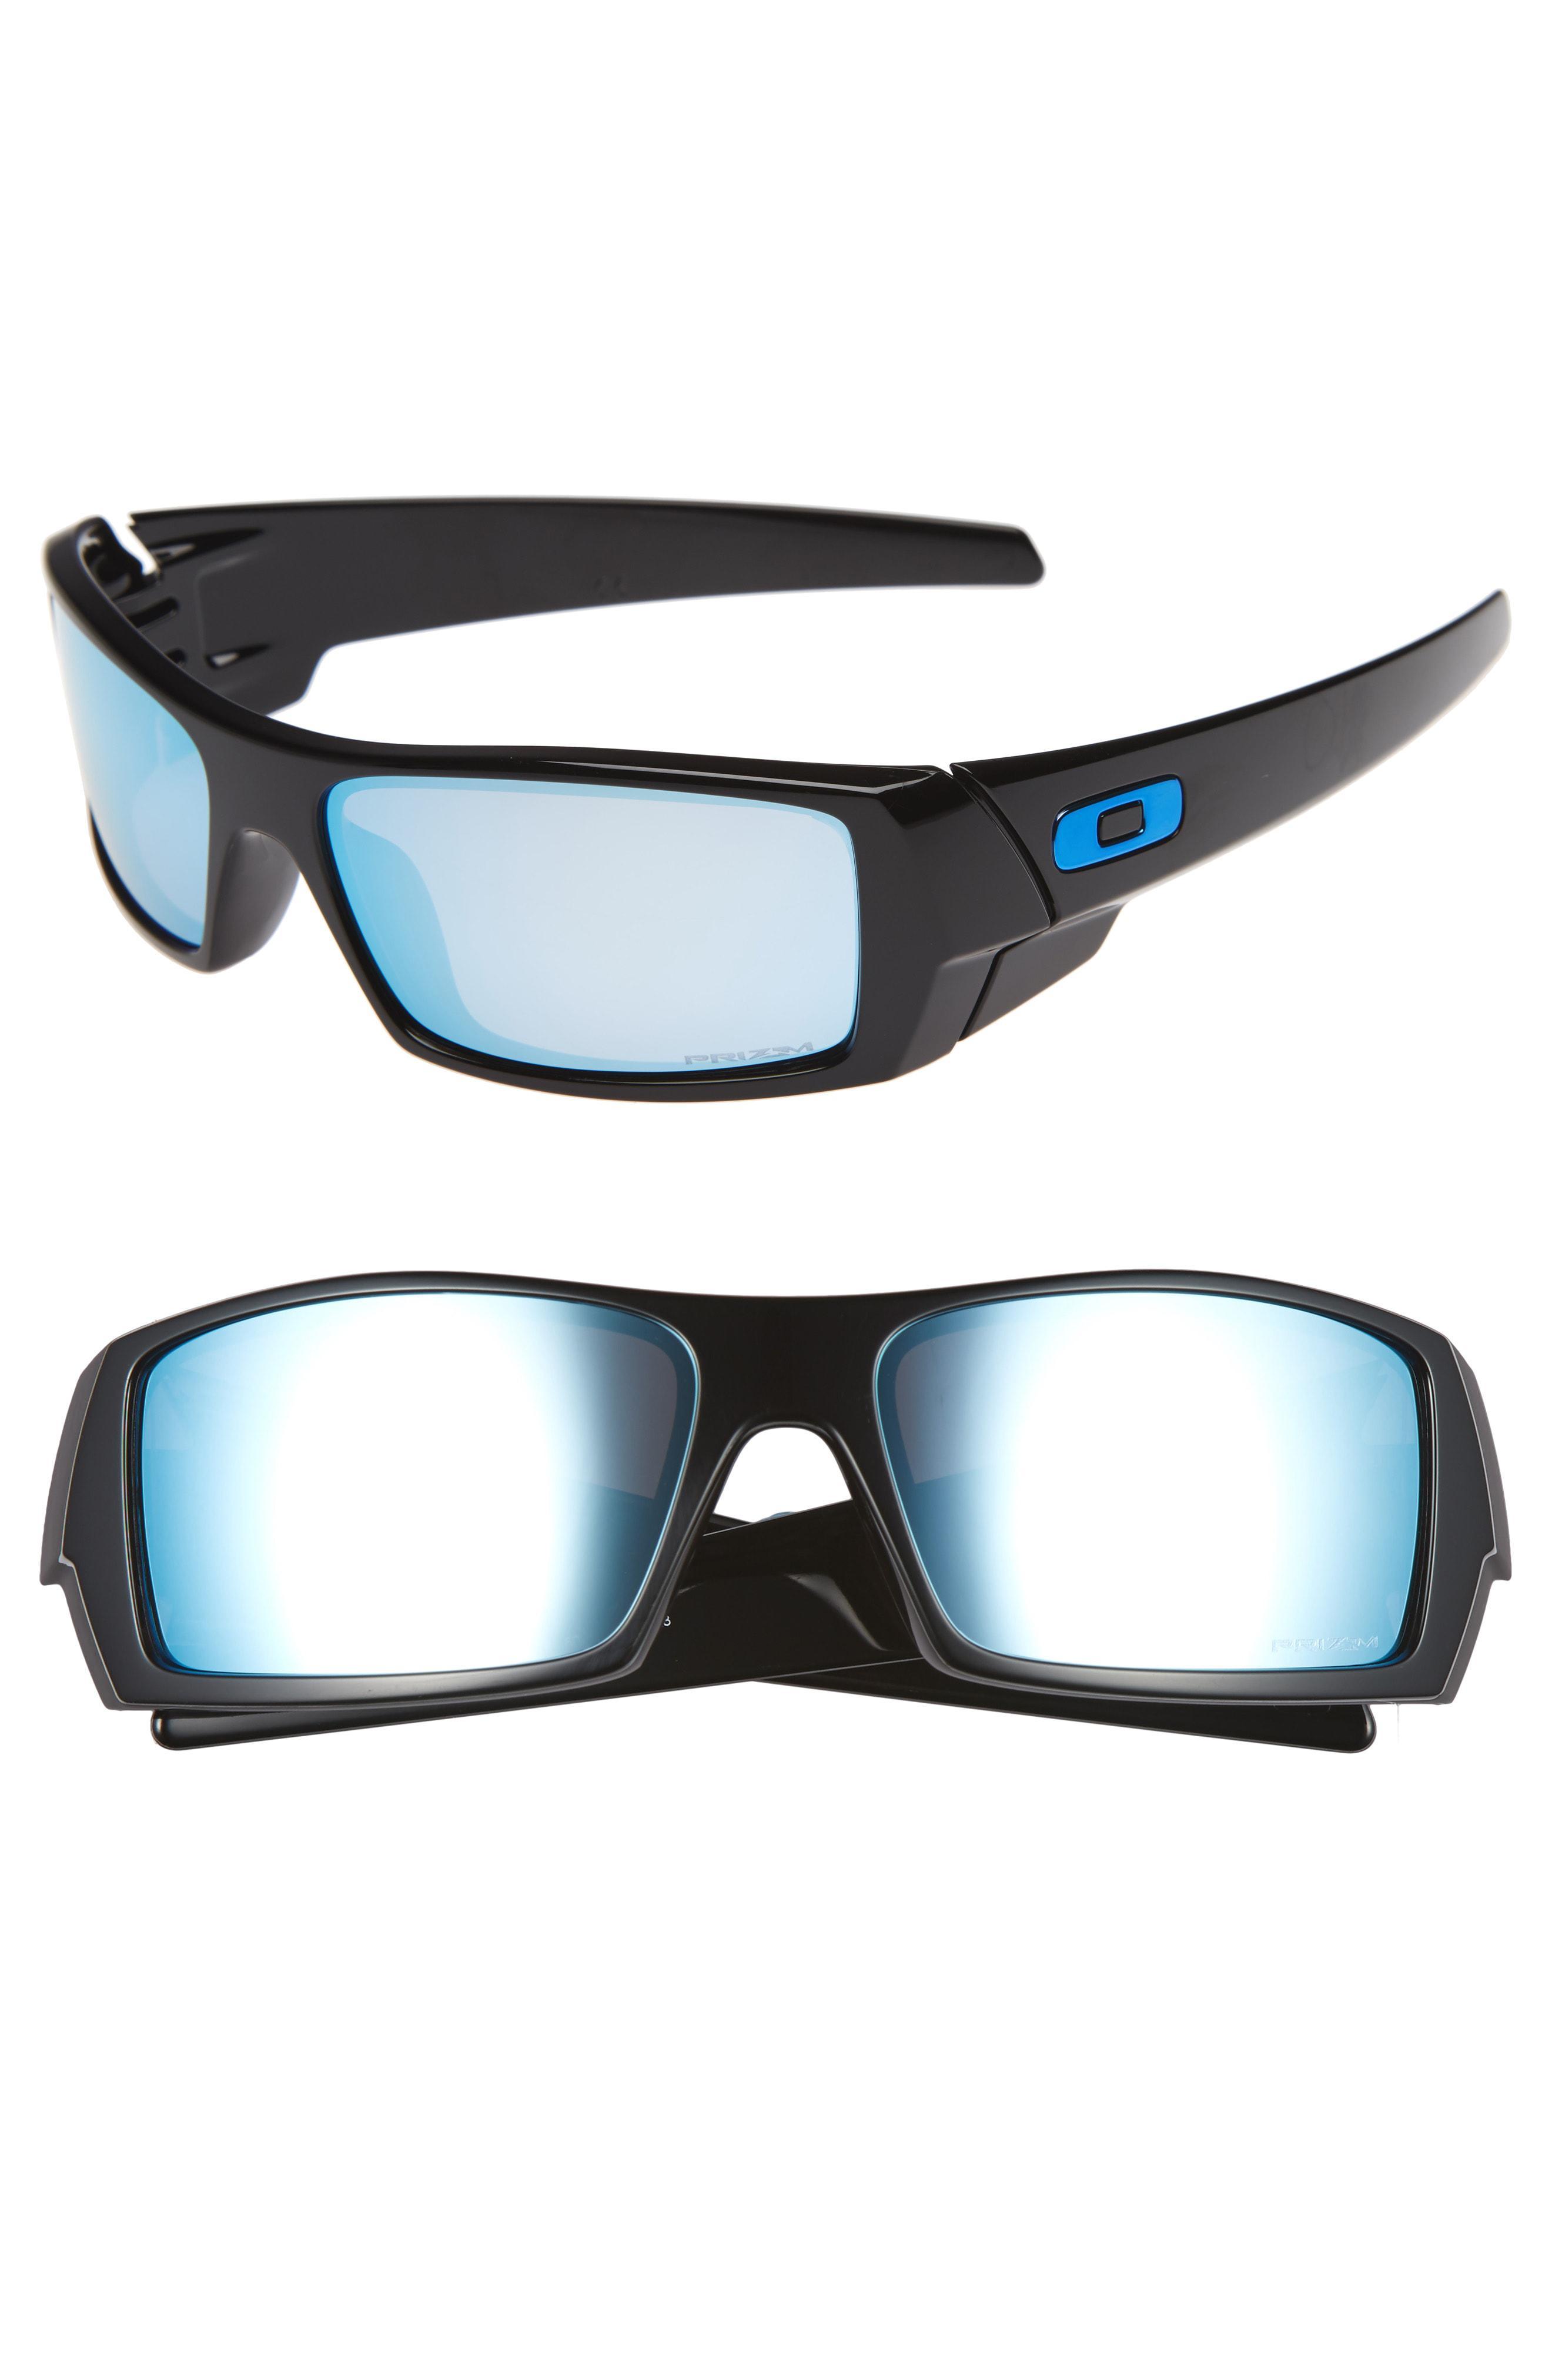 158fb7869e Lyst - Oakley Gascan Prizm 60mm Polarized Sunglasses - in Blue for Men